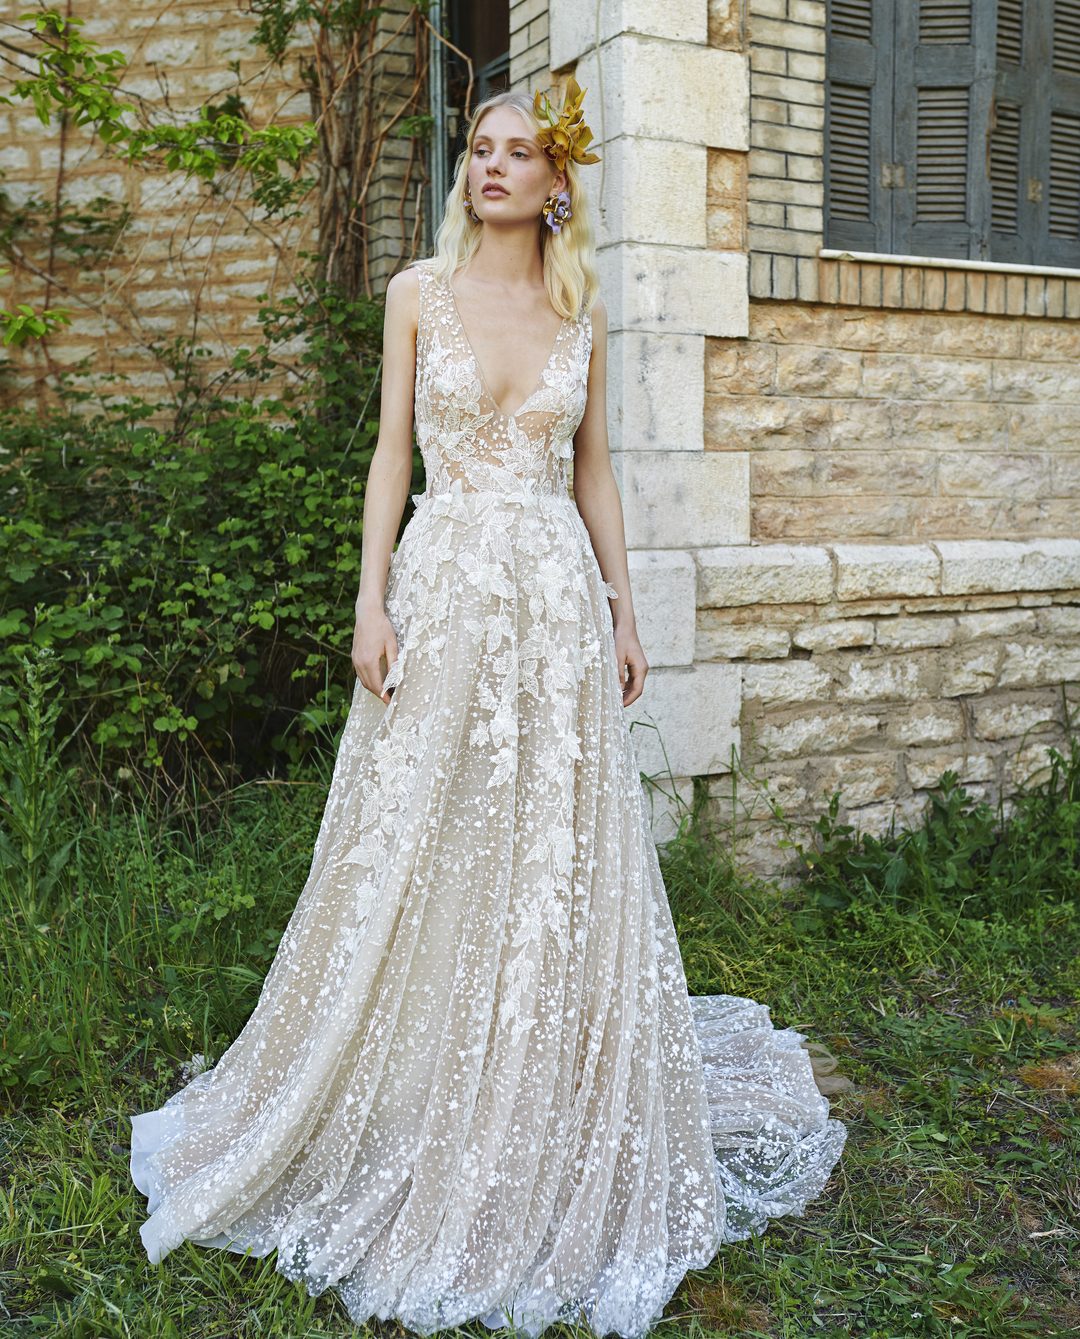 arcangela gown dress photo